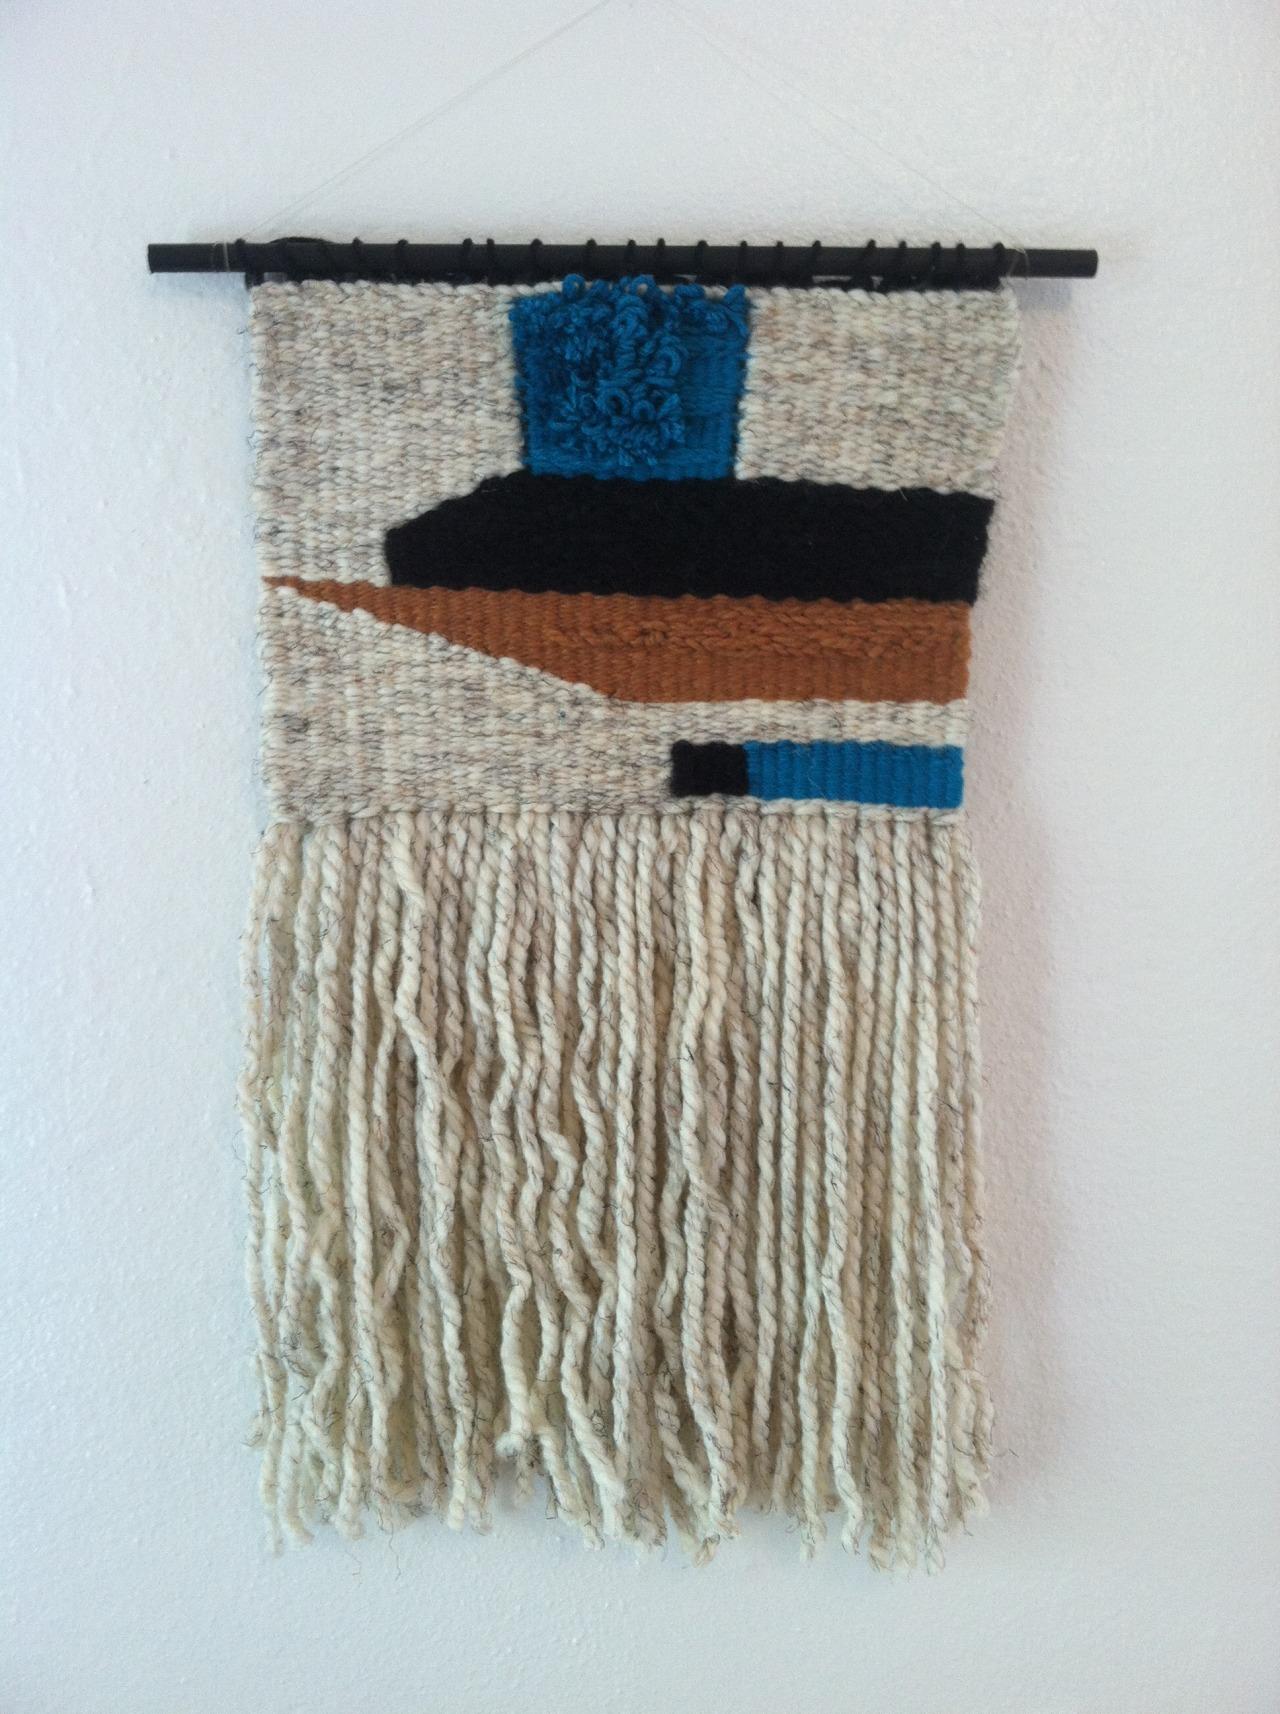 New weaving